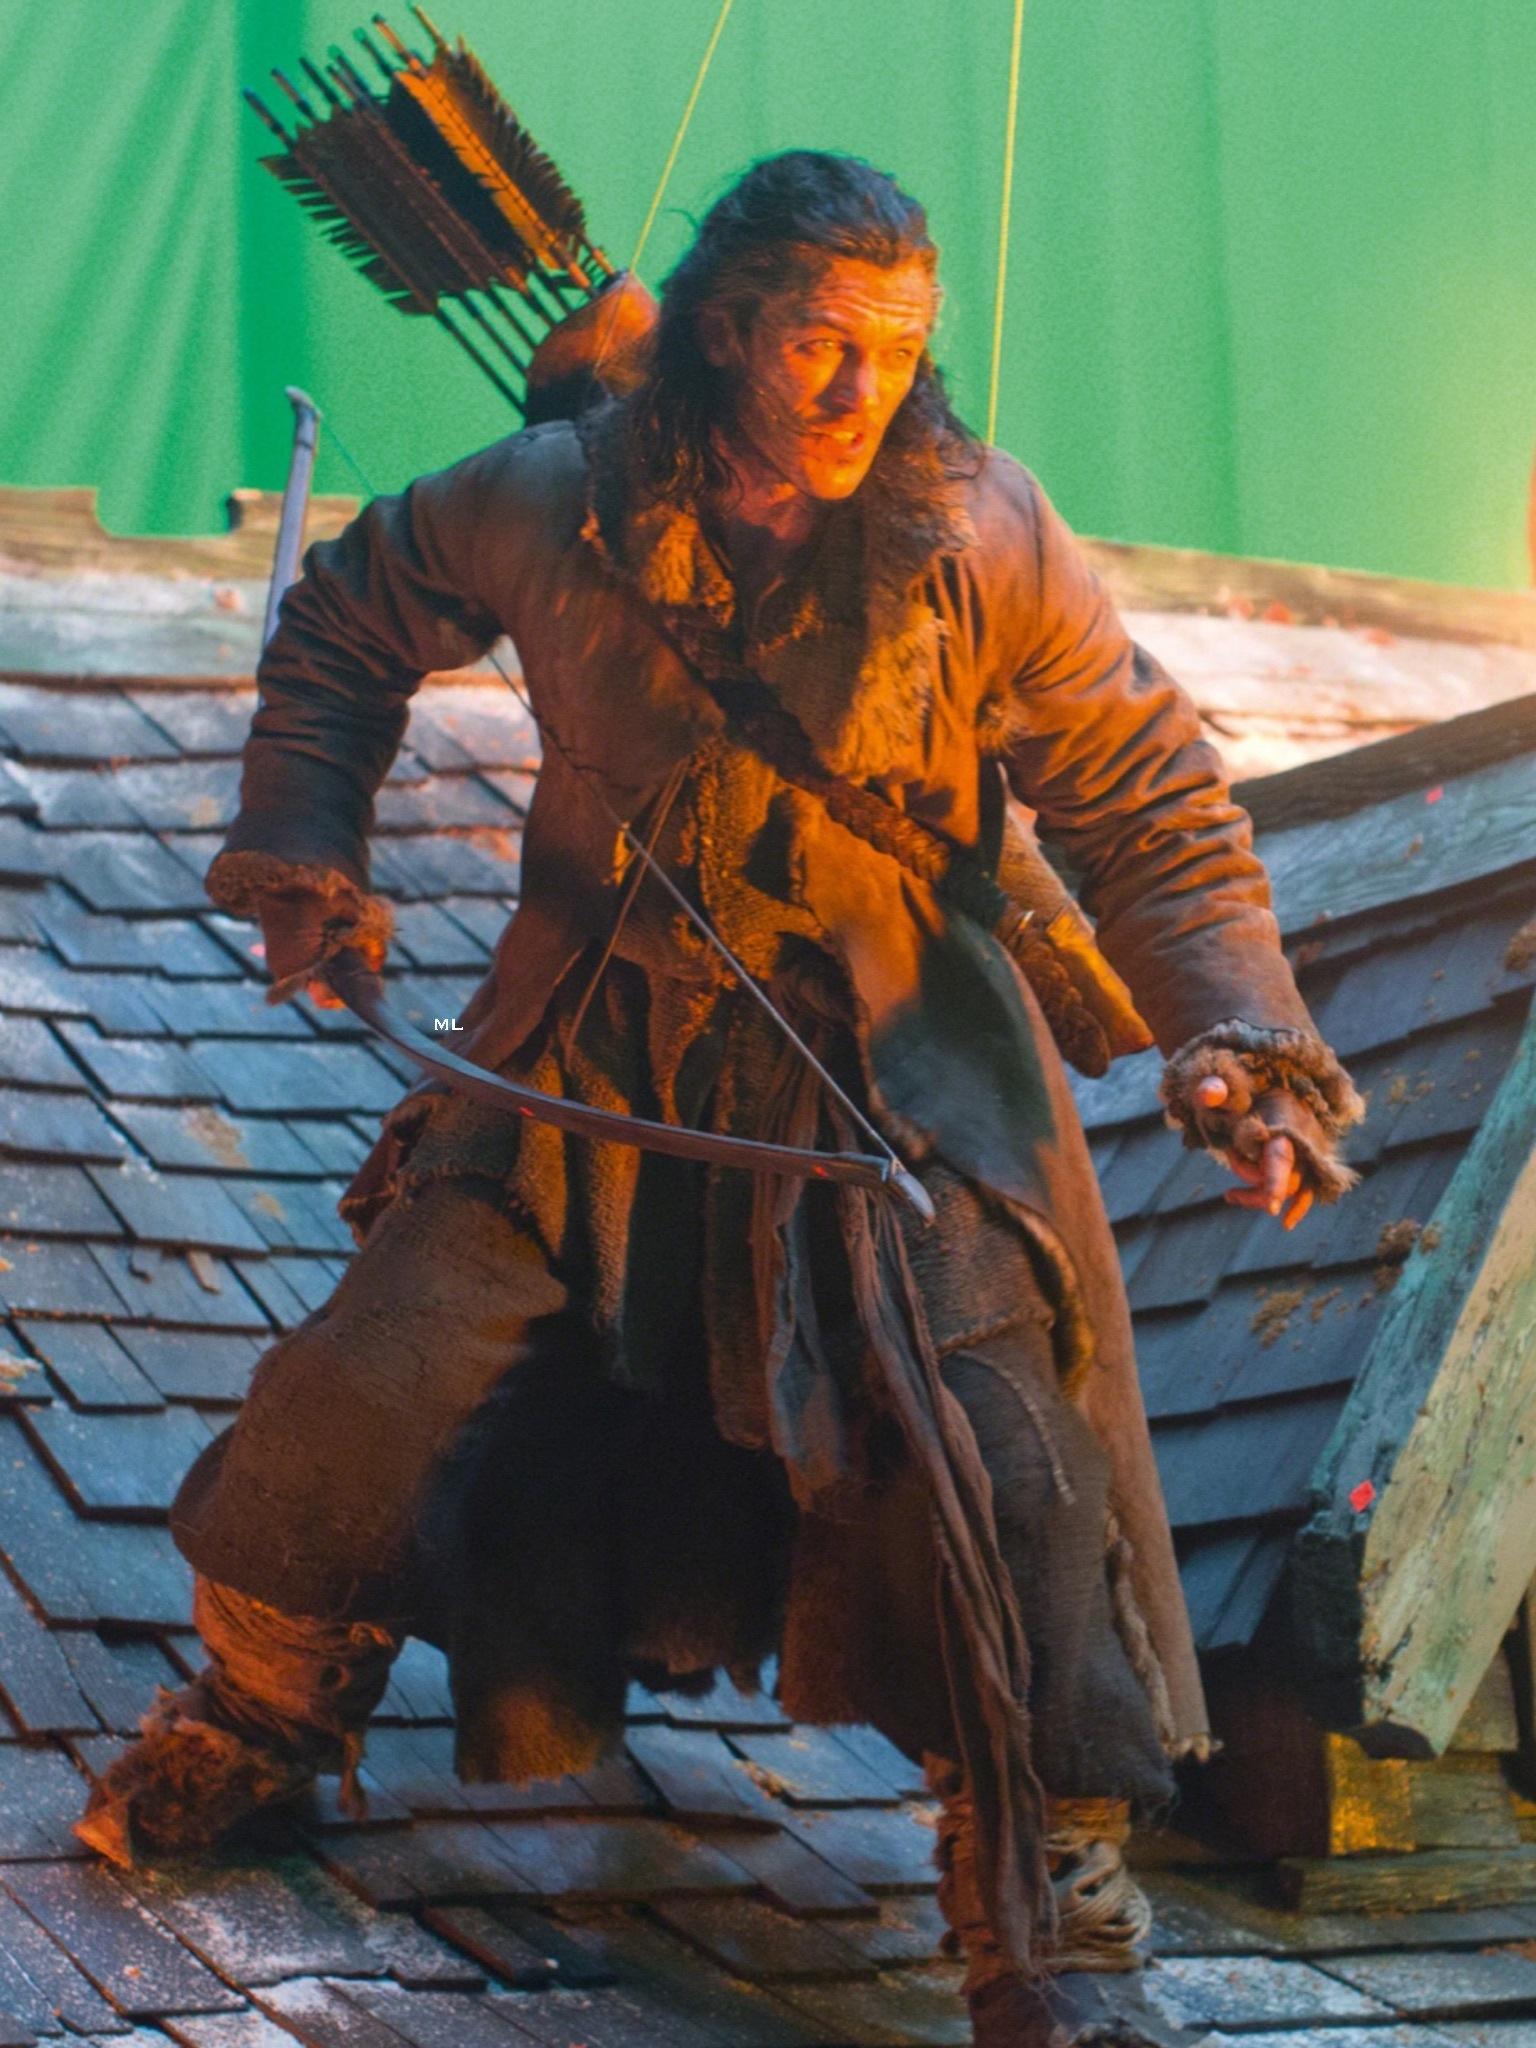 Luke Evans Der Hobbit